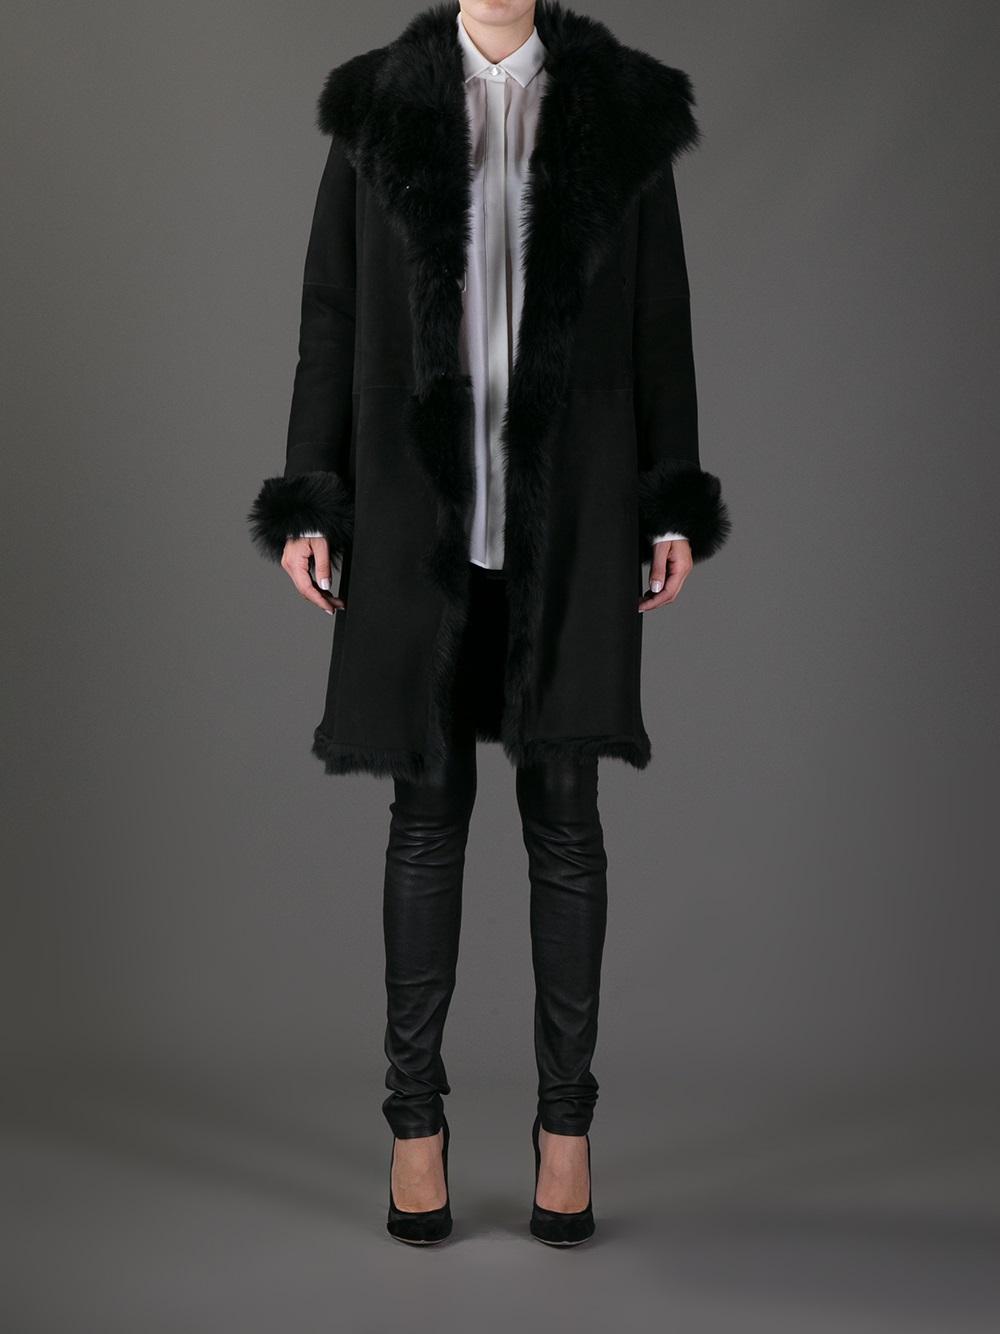 Joseph Anais Toscana Coat in Black | Lyst